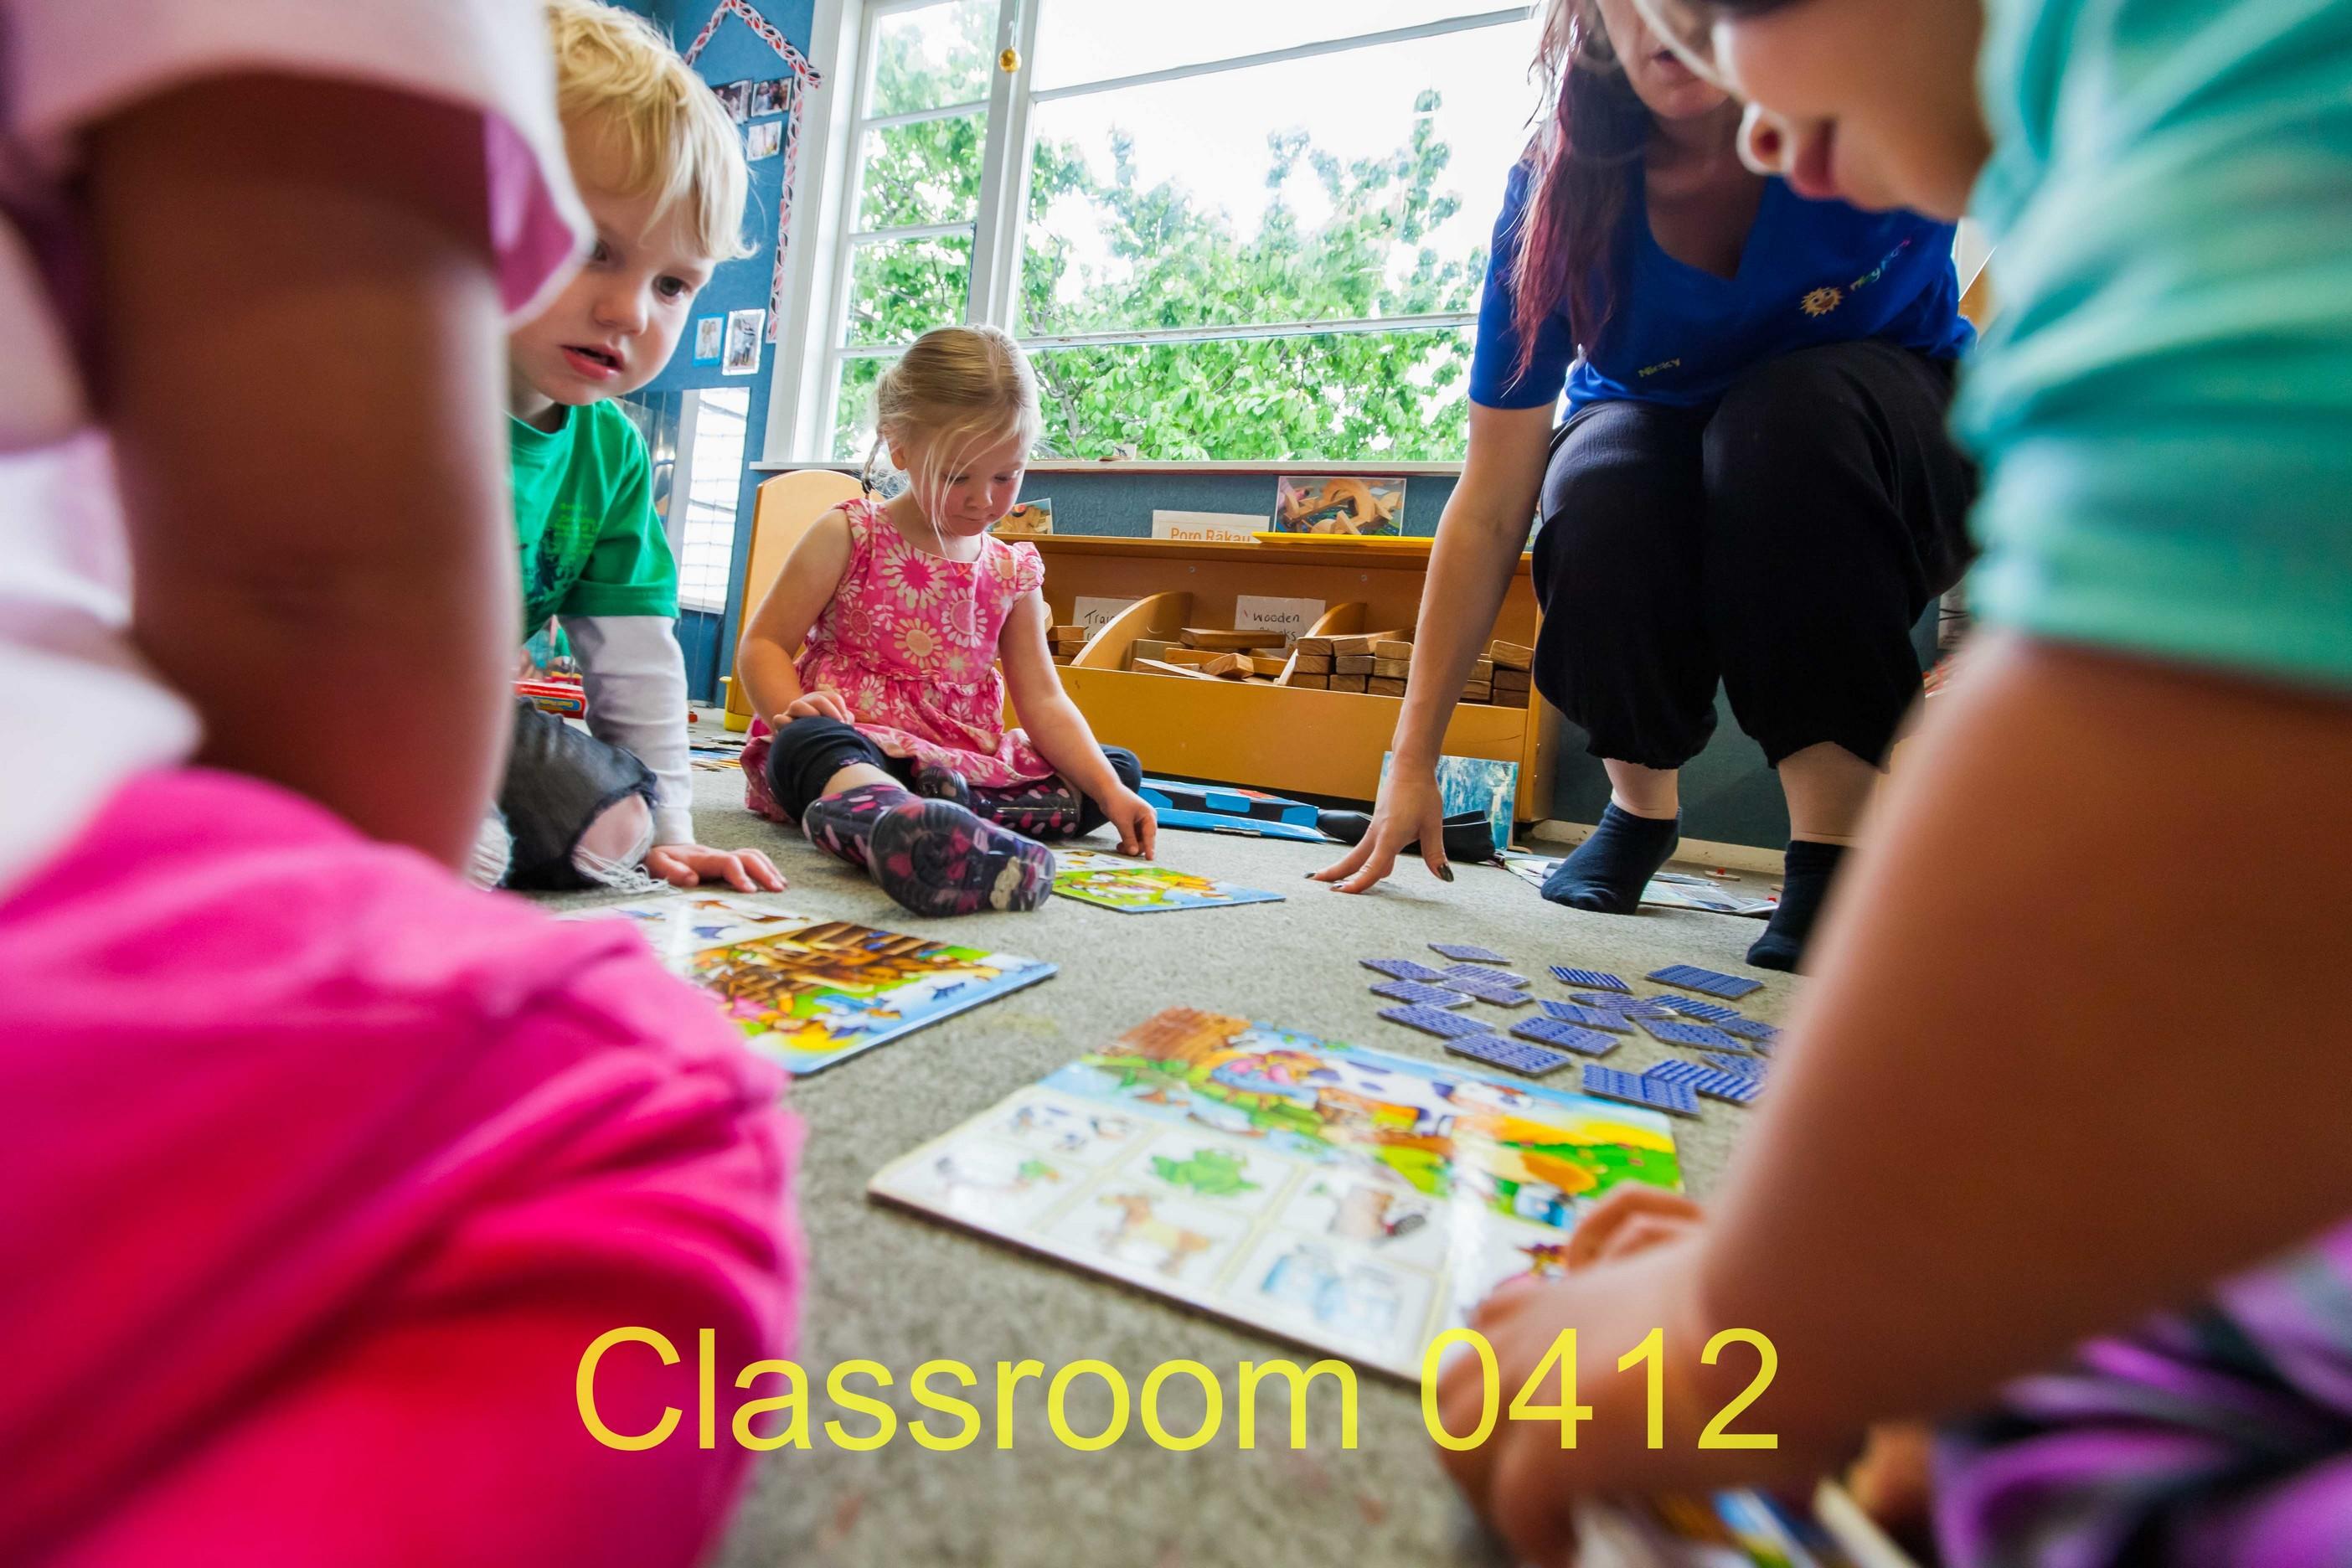 Classroom 0412